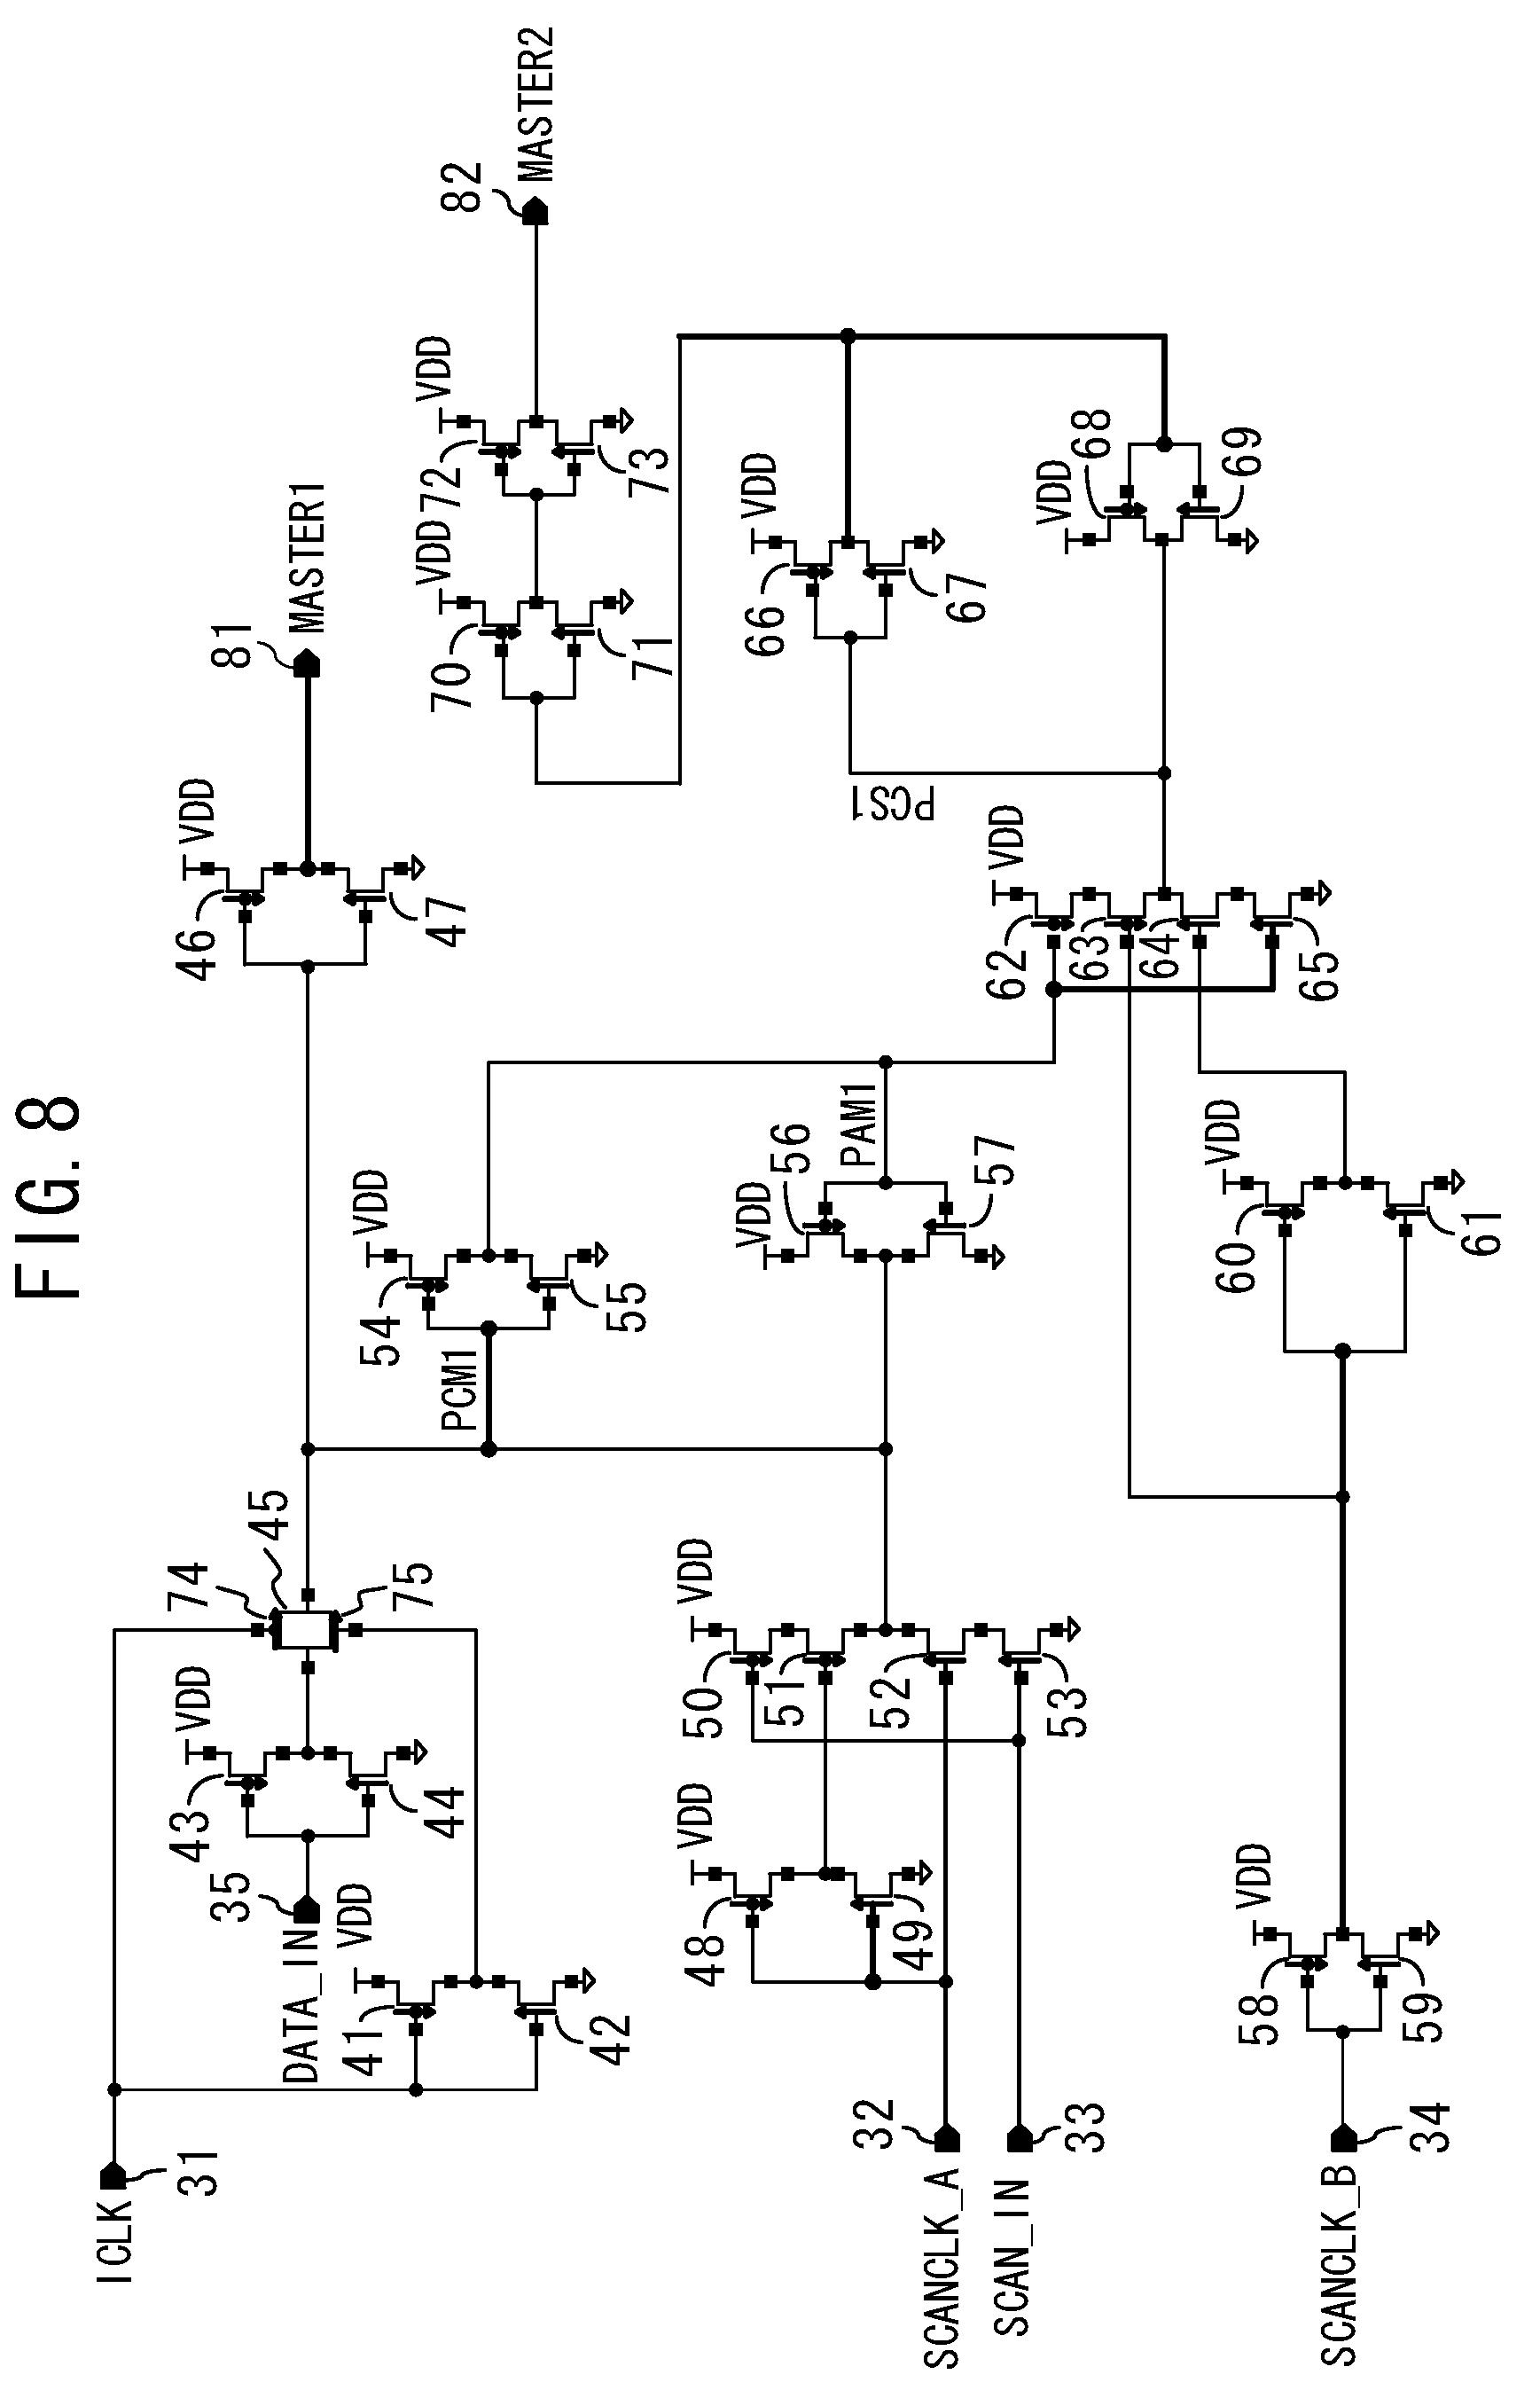 Latching Circuit Diagram Latching Free Engine Image For